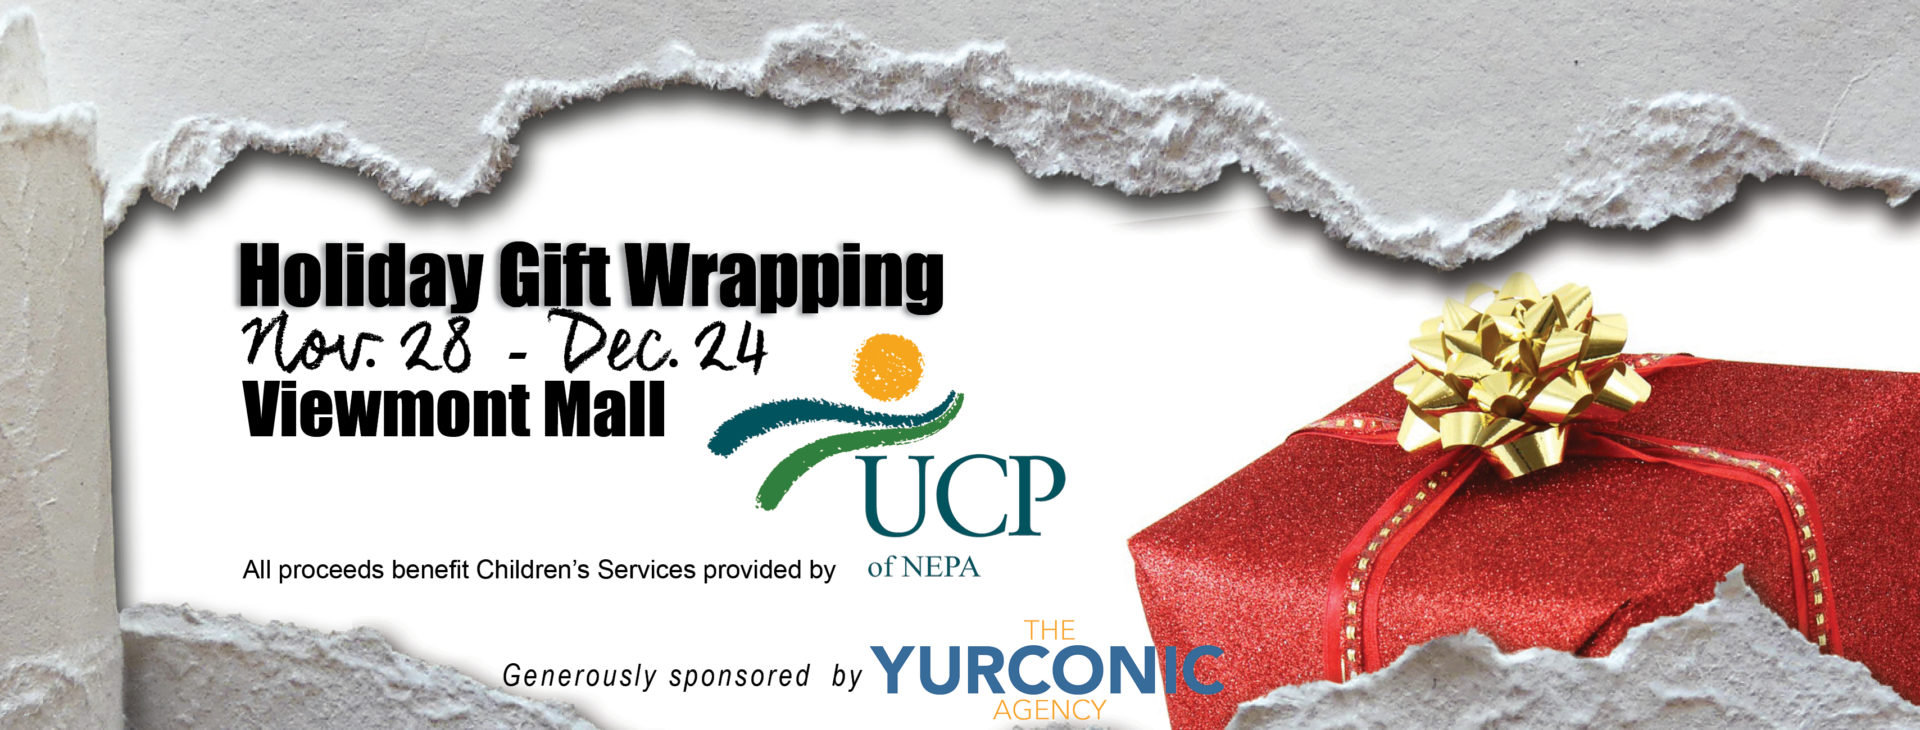 giftwrapping2019_V2 copyforwebsiterotator_finalv2copyof2